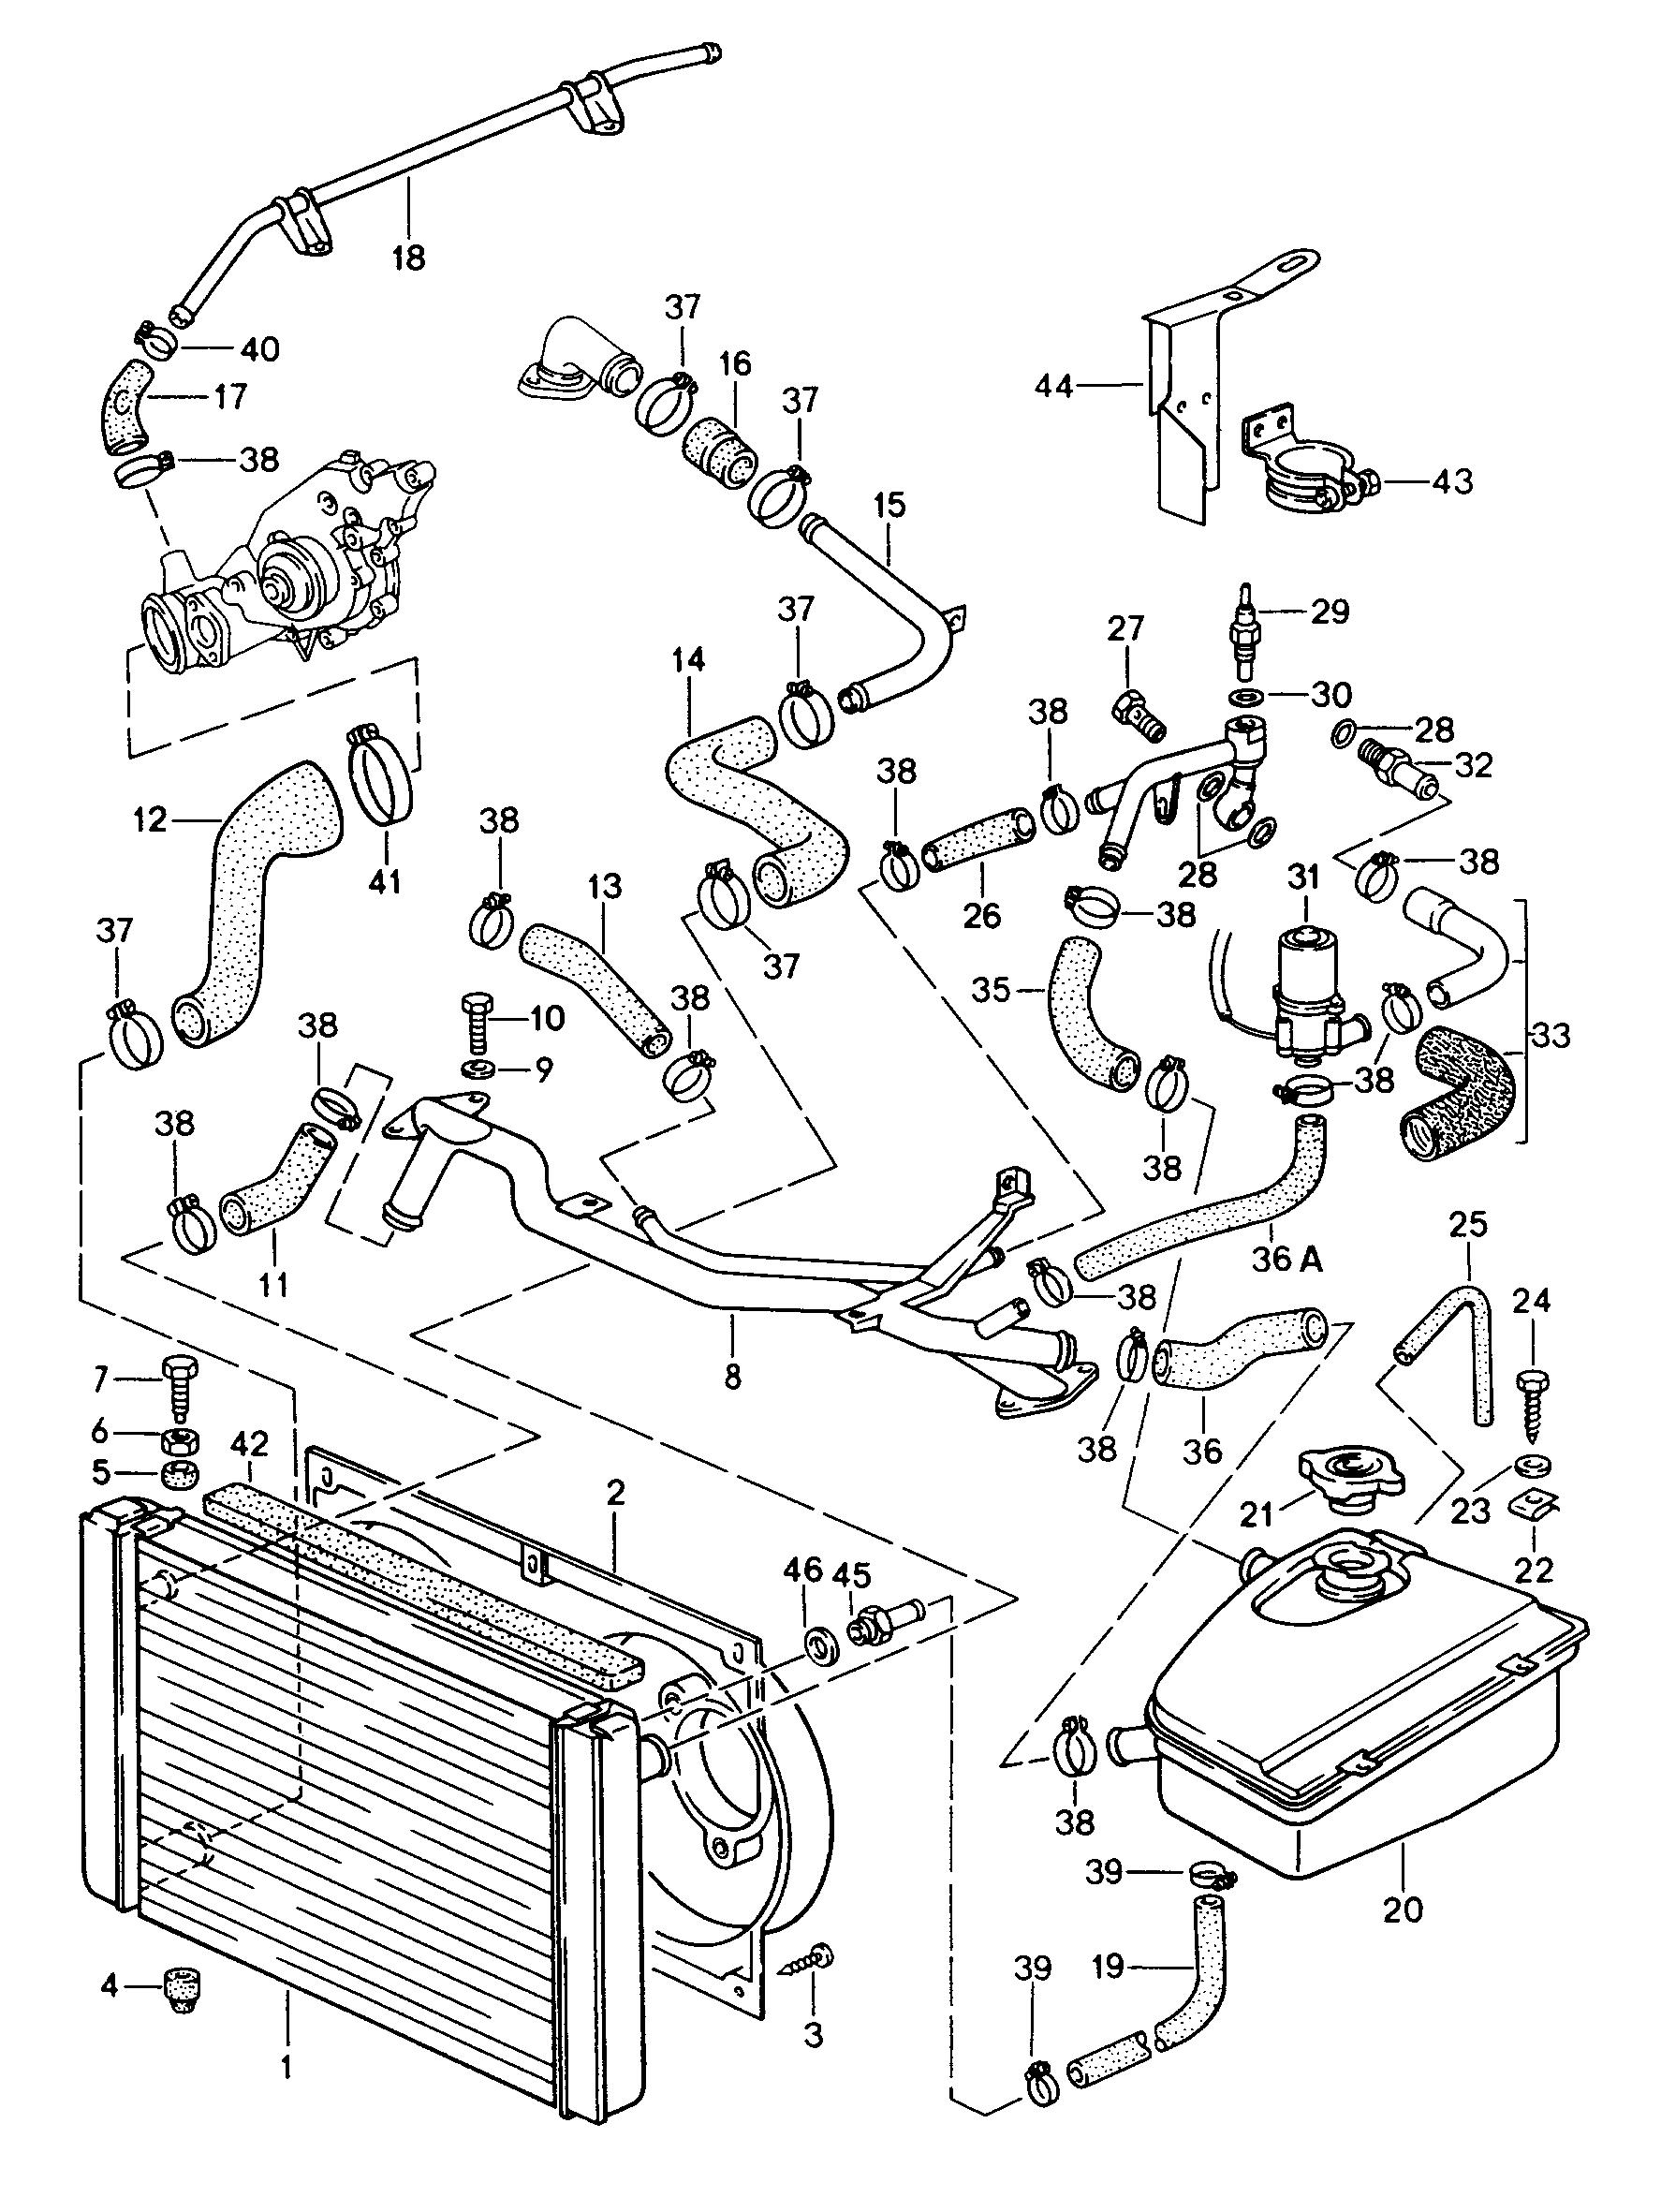 Porsche 944 Engine Diagram - Example Wiring Diagram on